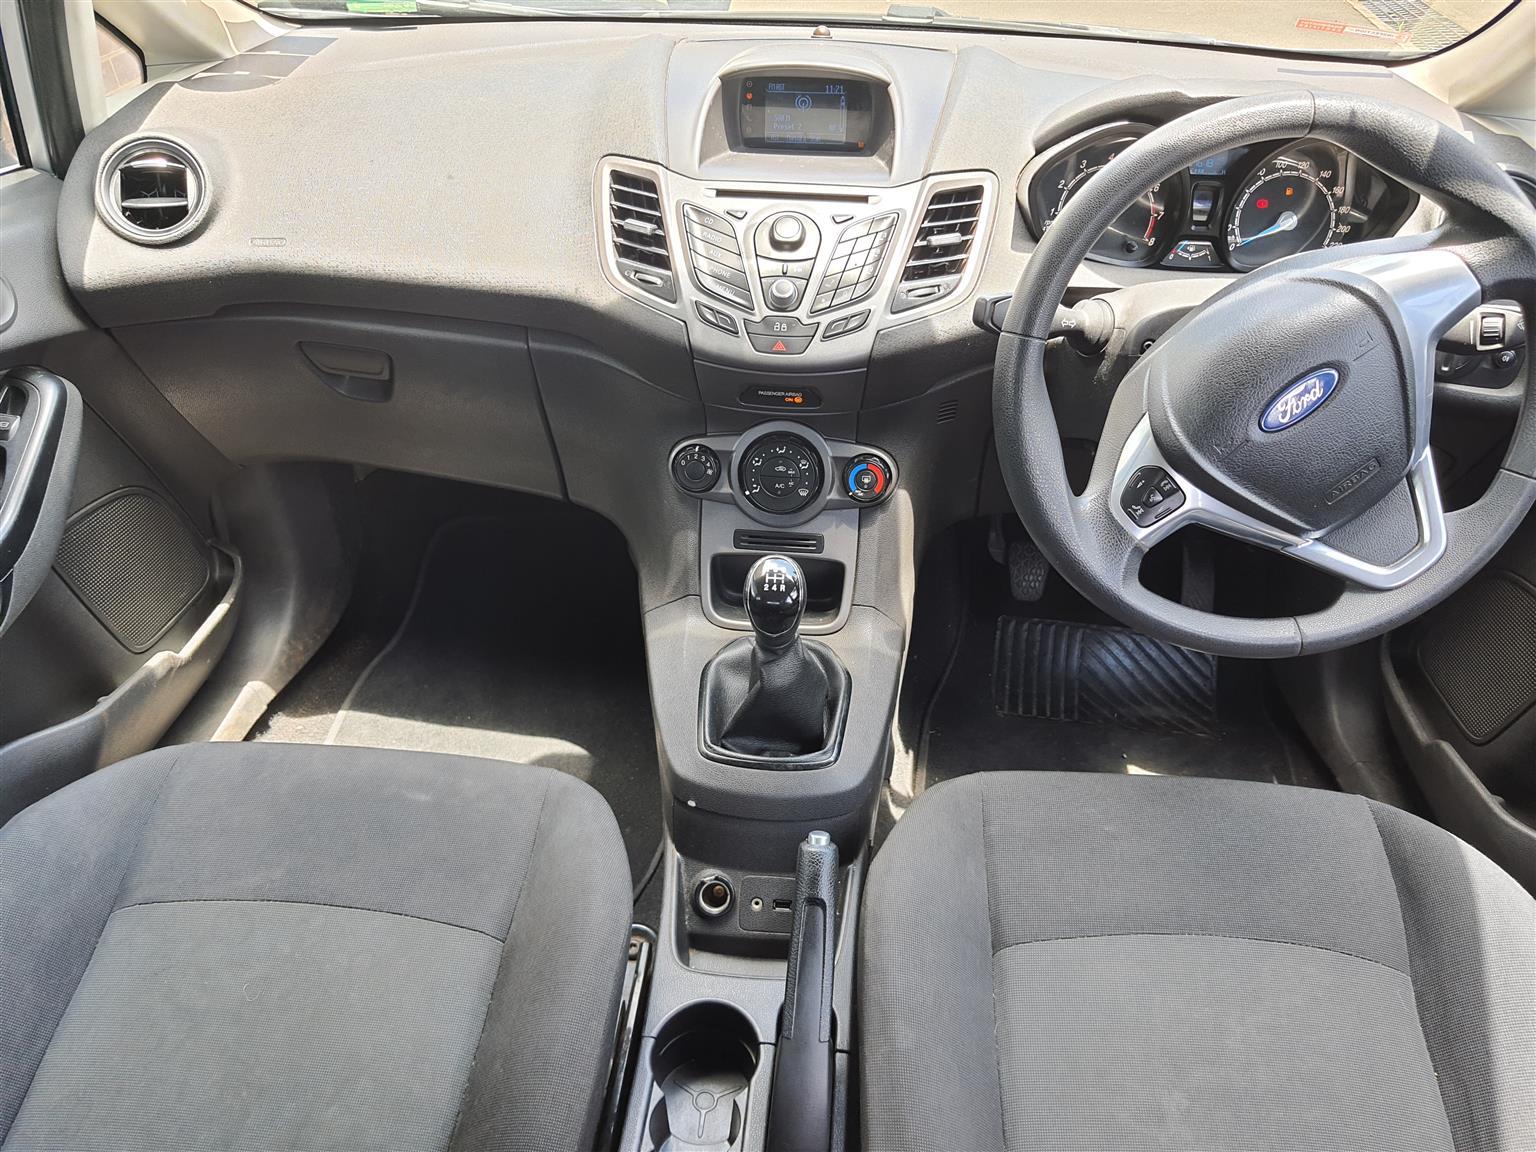 2013 Ford Fiesta 1.4 5 door Ambiente